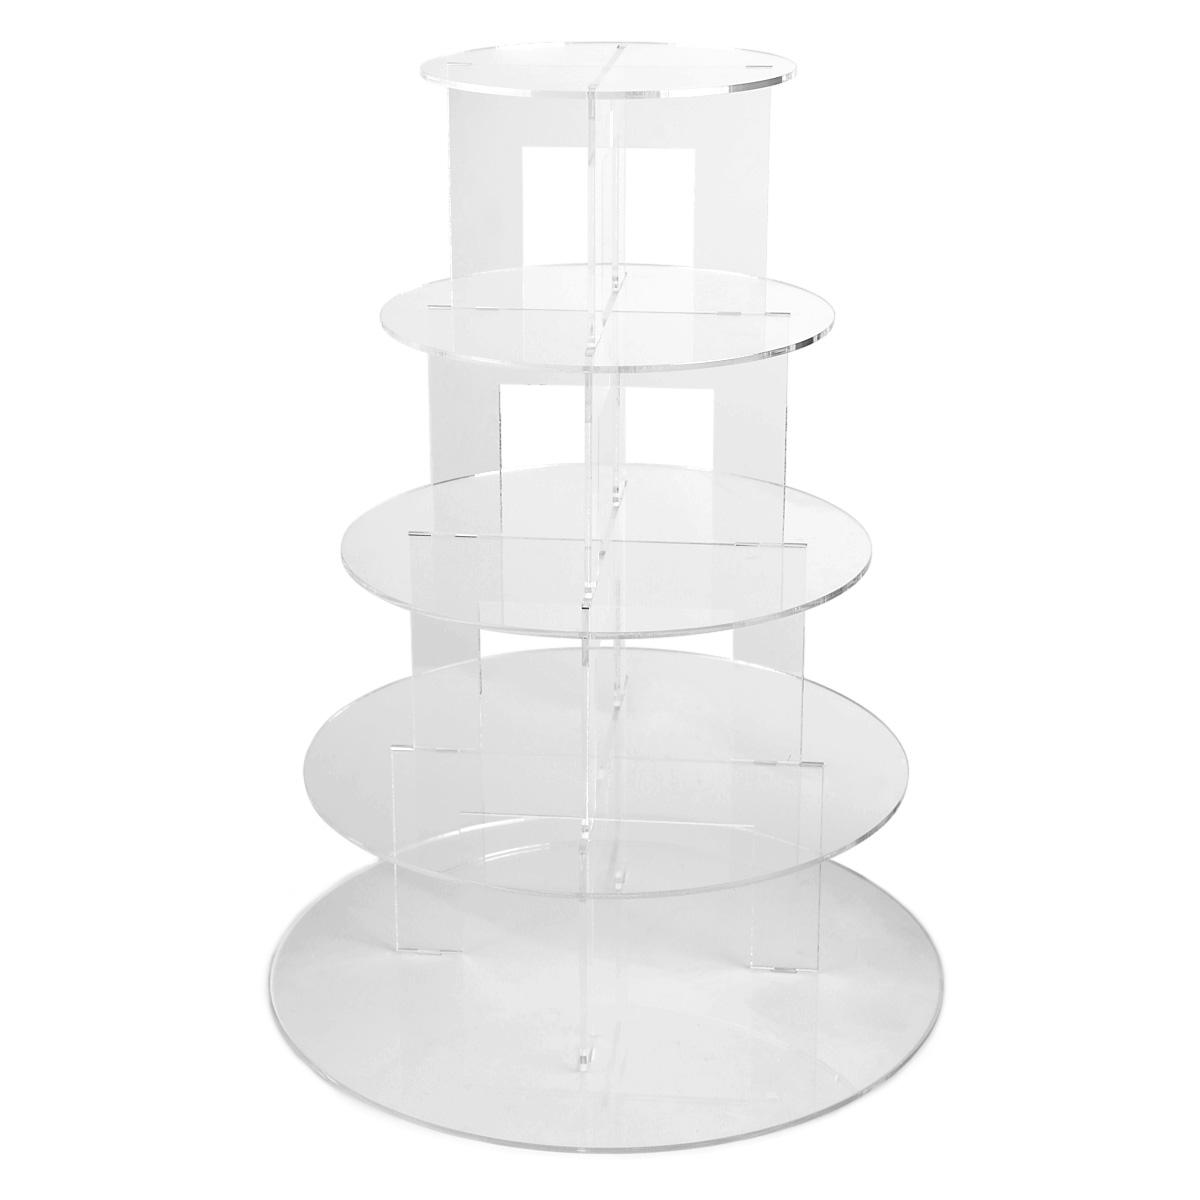 5 etages pr sentoir g teau acrylique support stand mariage f te cupcake muffin ebay. Black Bedroom Furniture Sets. Home Design Ideas